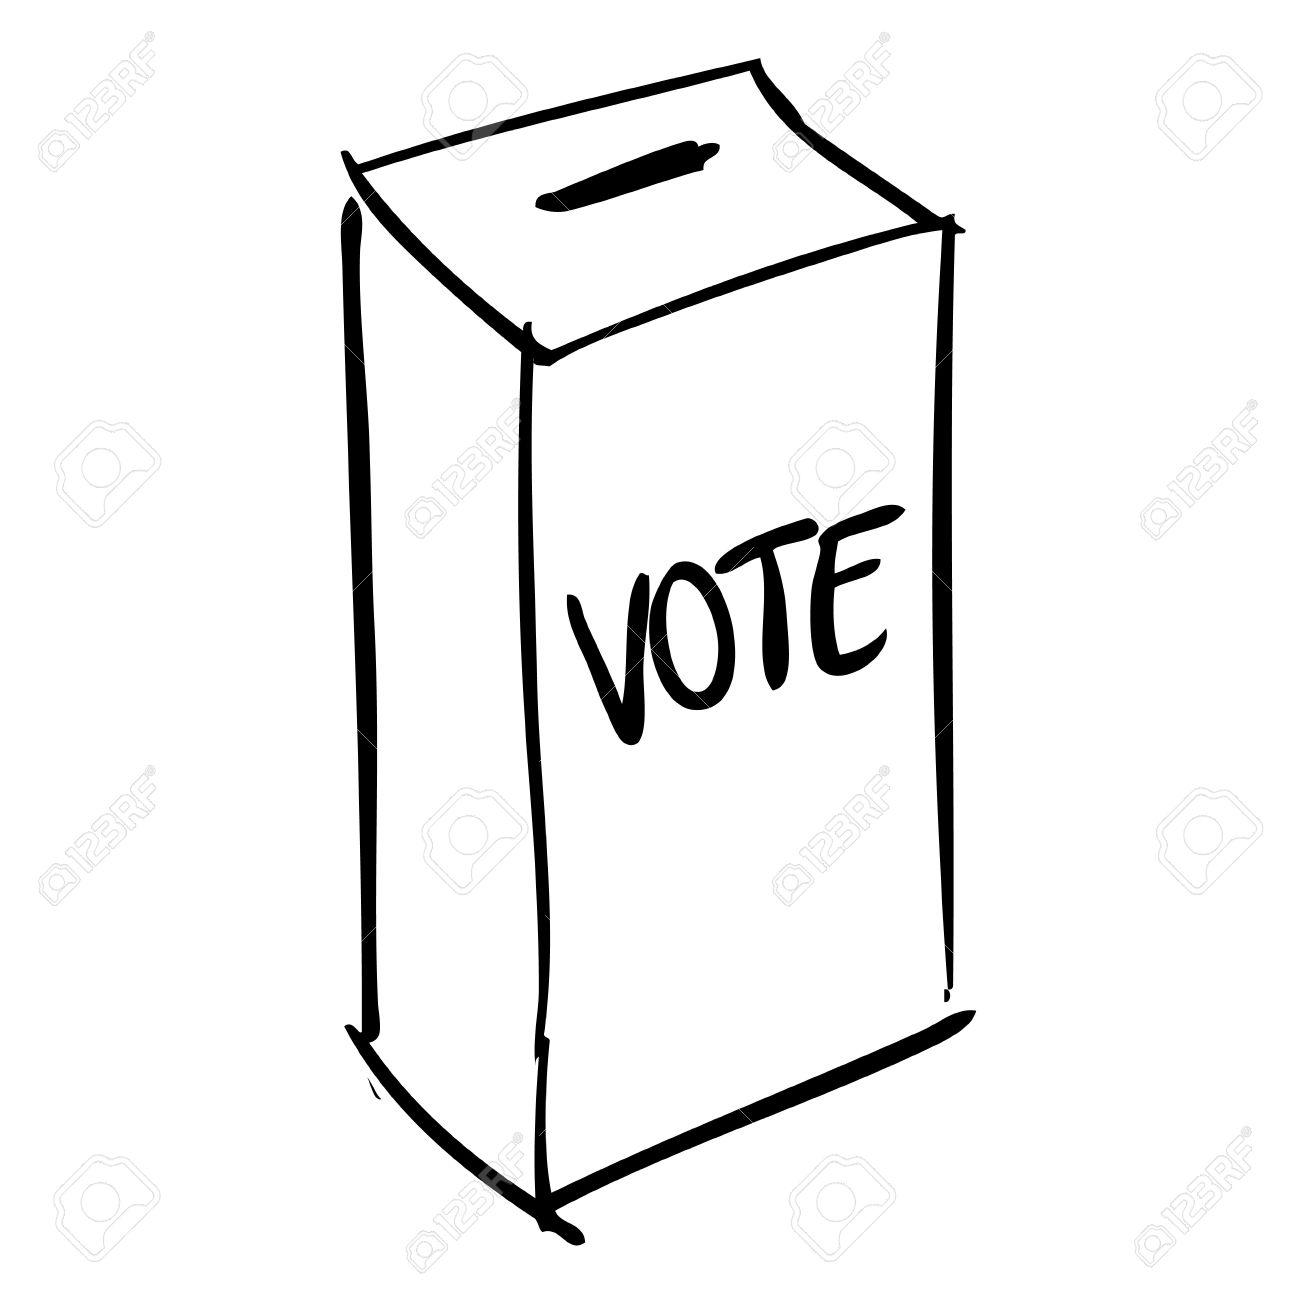 1300x1300 Vote Box Election Box Doodle Royalty Free Cliparts, Vectors,